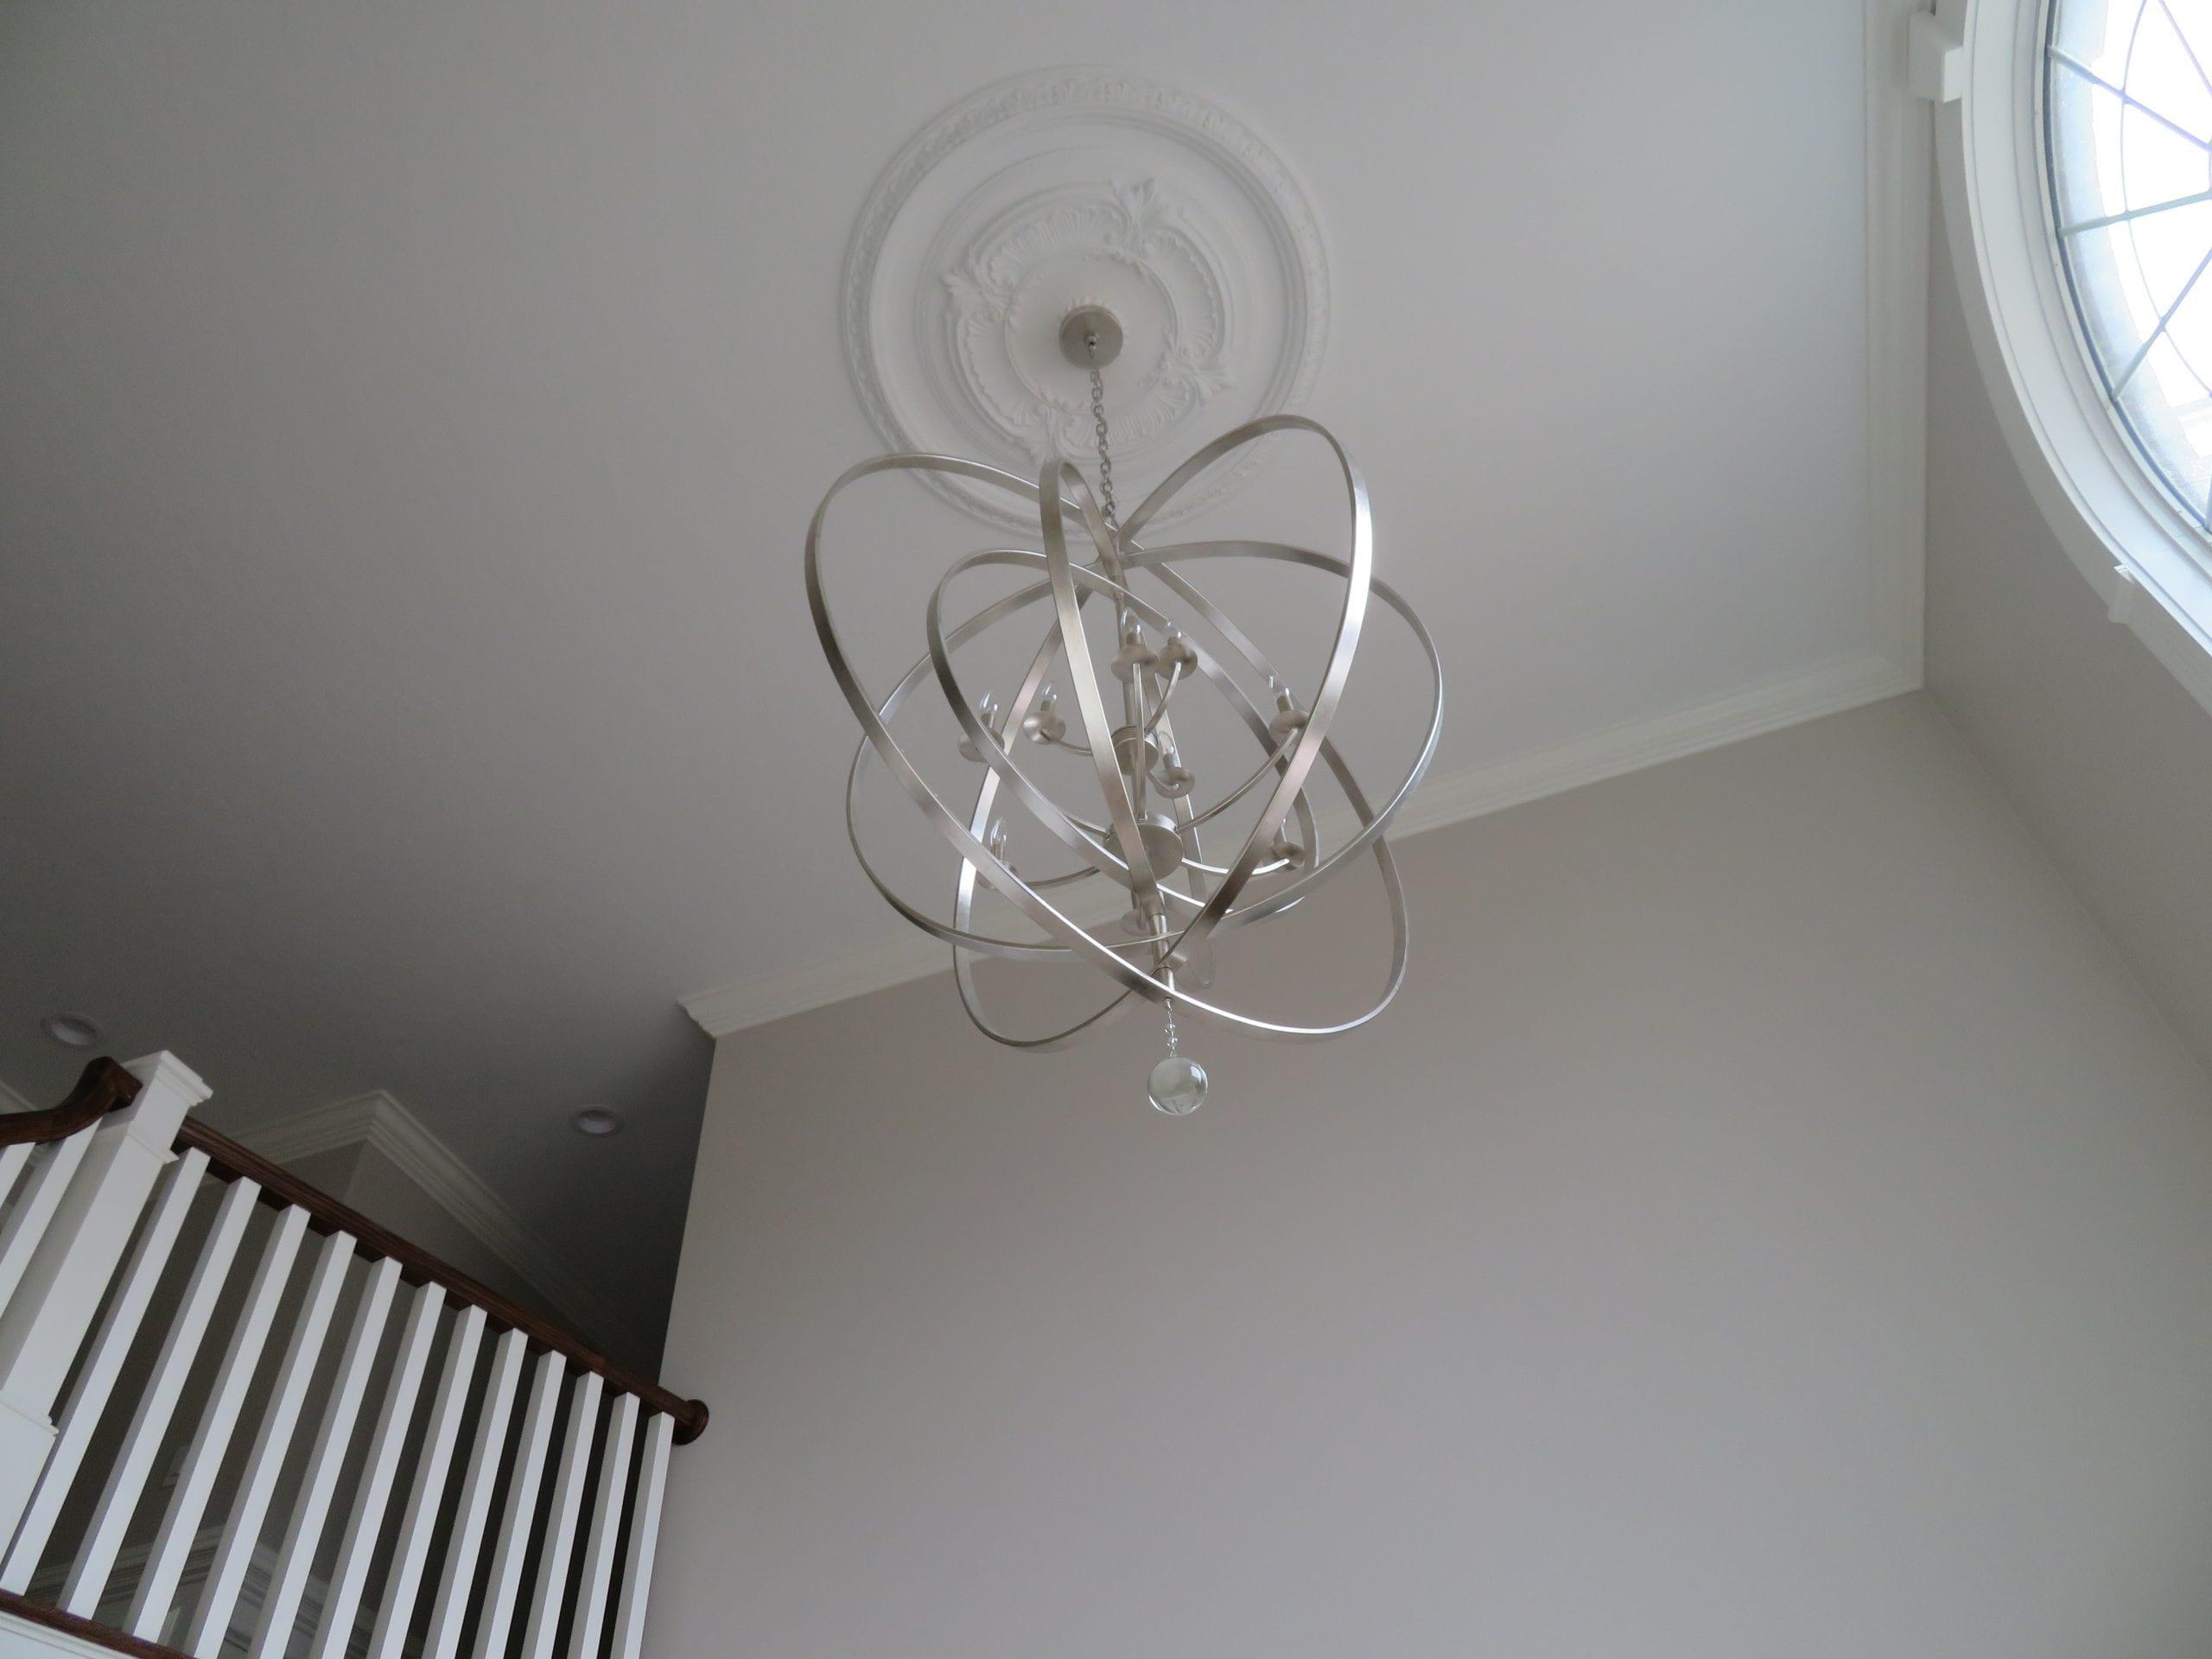 Foyer Decorative Lighting Fixture